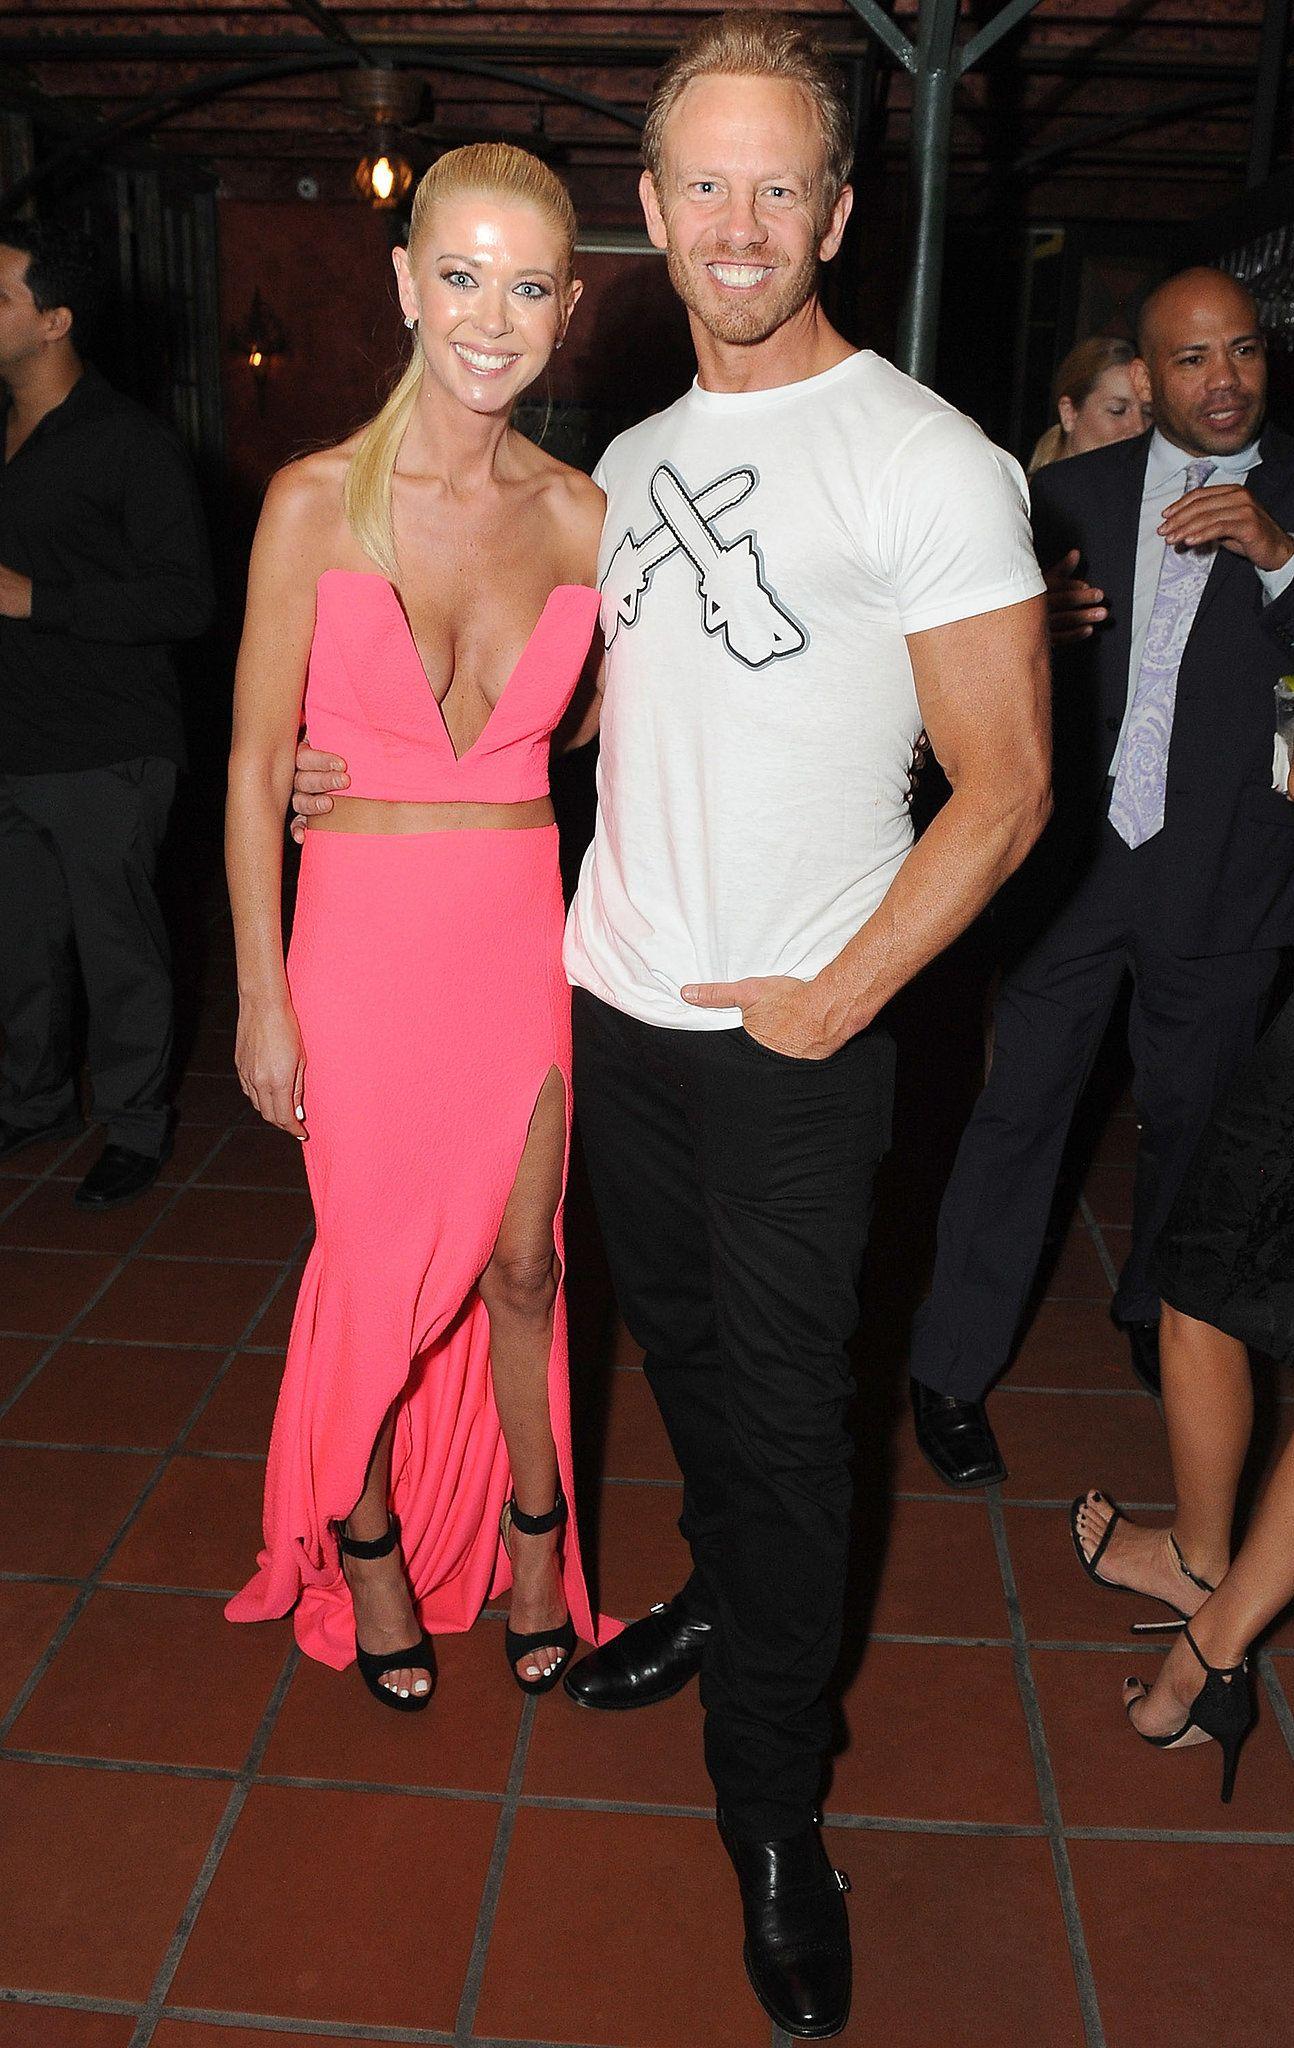 Tara Reid And Ian Ziering Attended A Bash For Sharknado 2